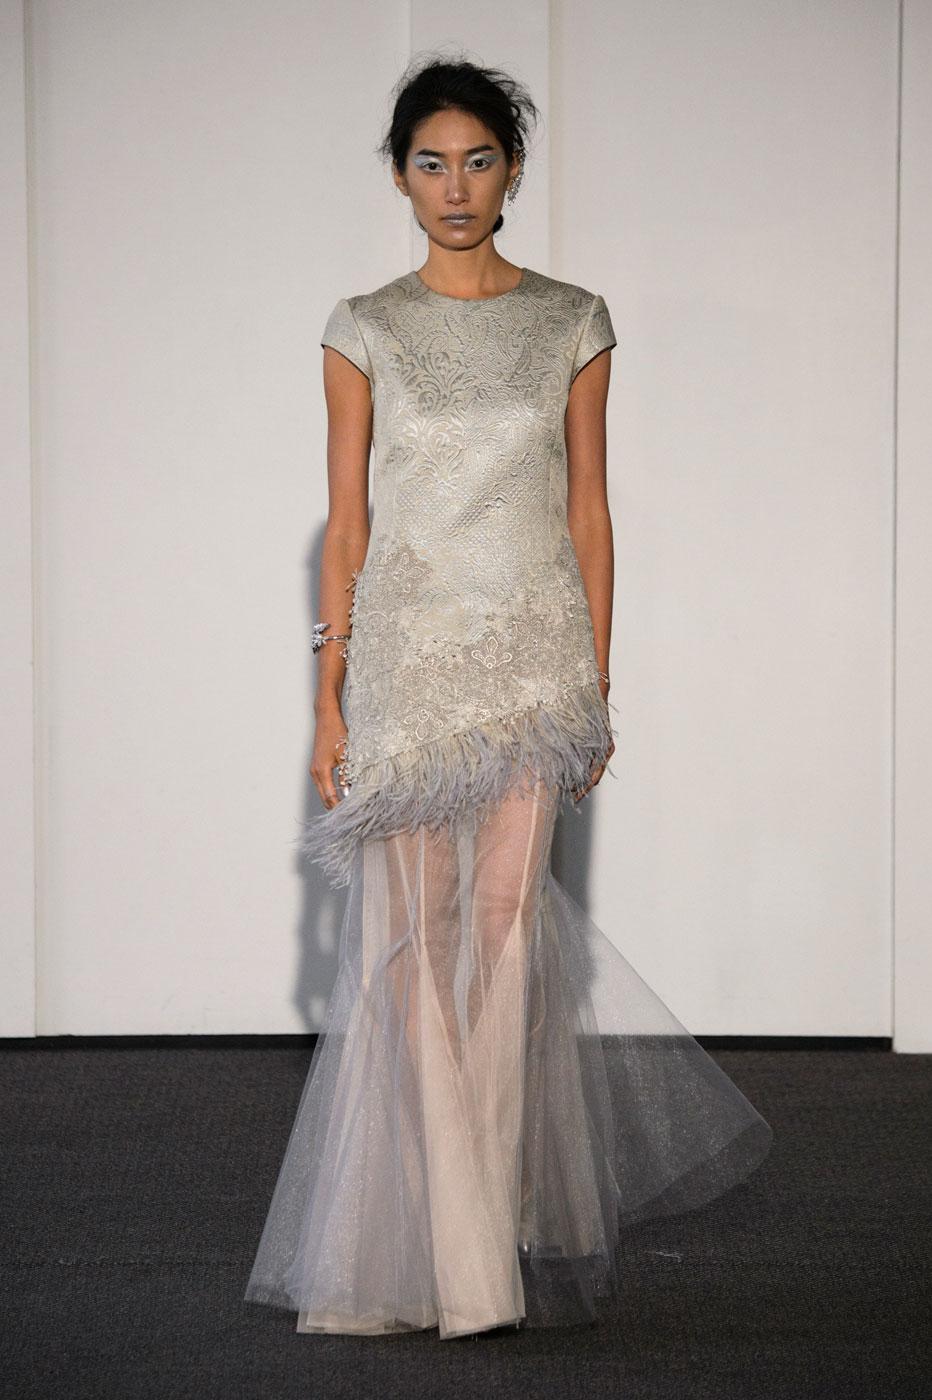 Busardi-fashion-runway-show-haute-couture-paris-spring-2015-the-impression-58